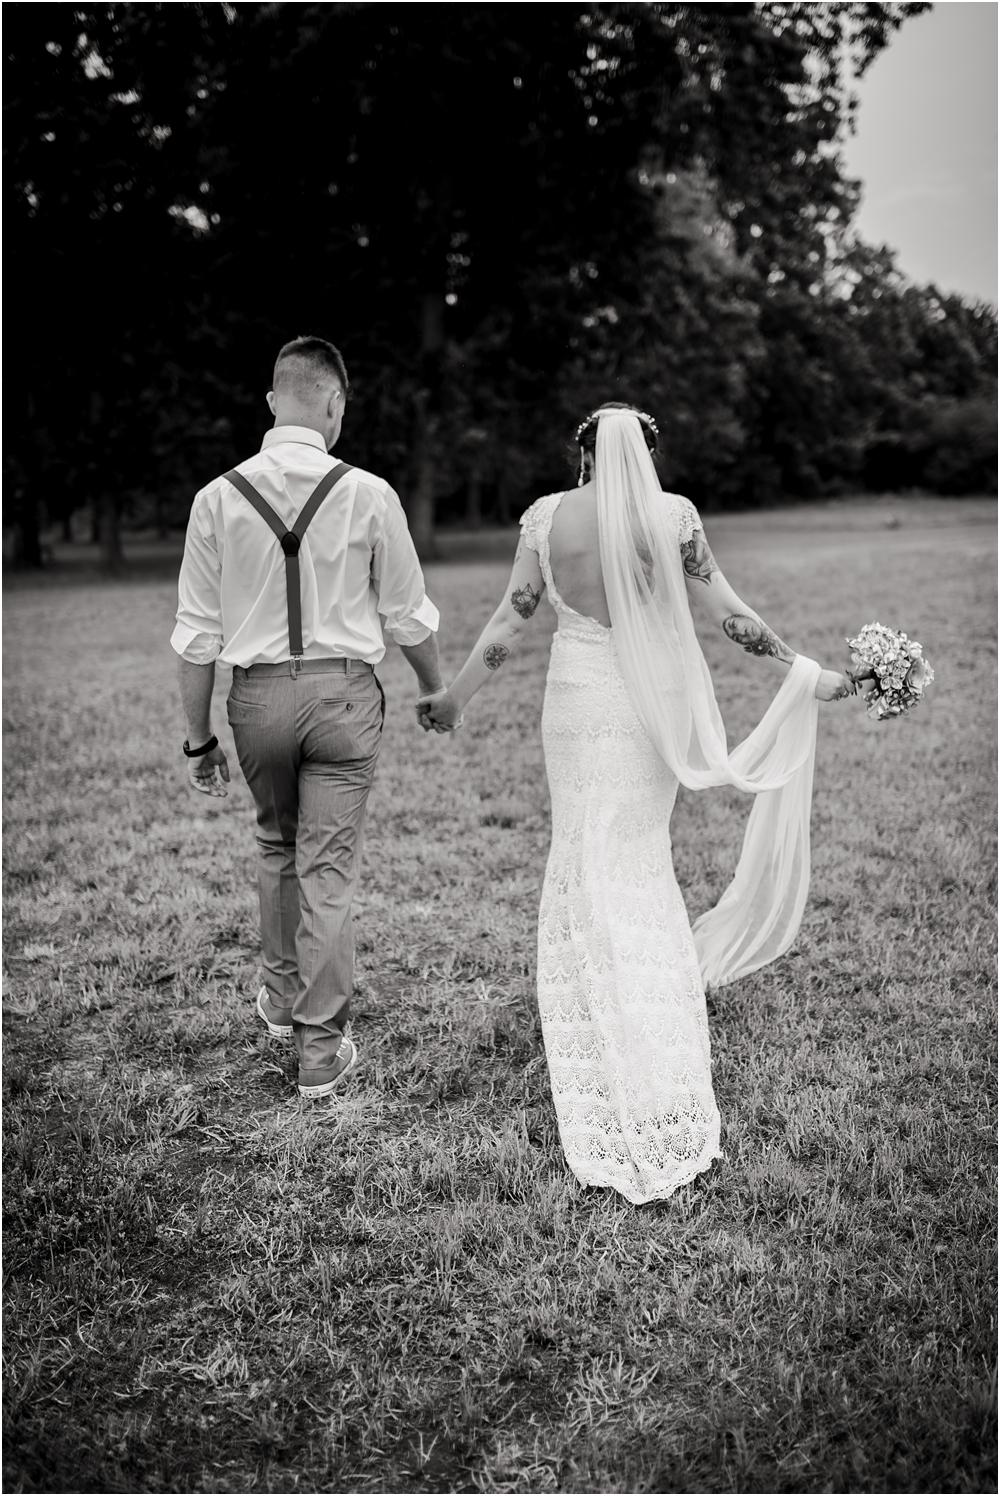 the-barn-at-wateroaks-circus-florida-wedding-photographer-kiersten-stevenson-photography-56.jpg